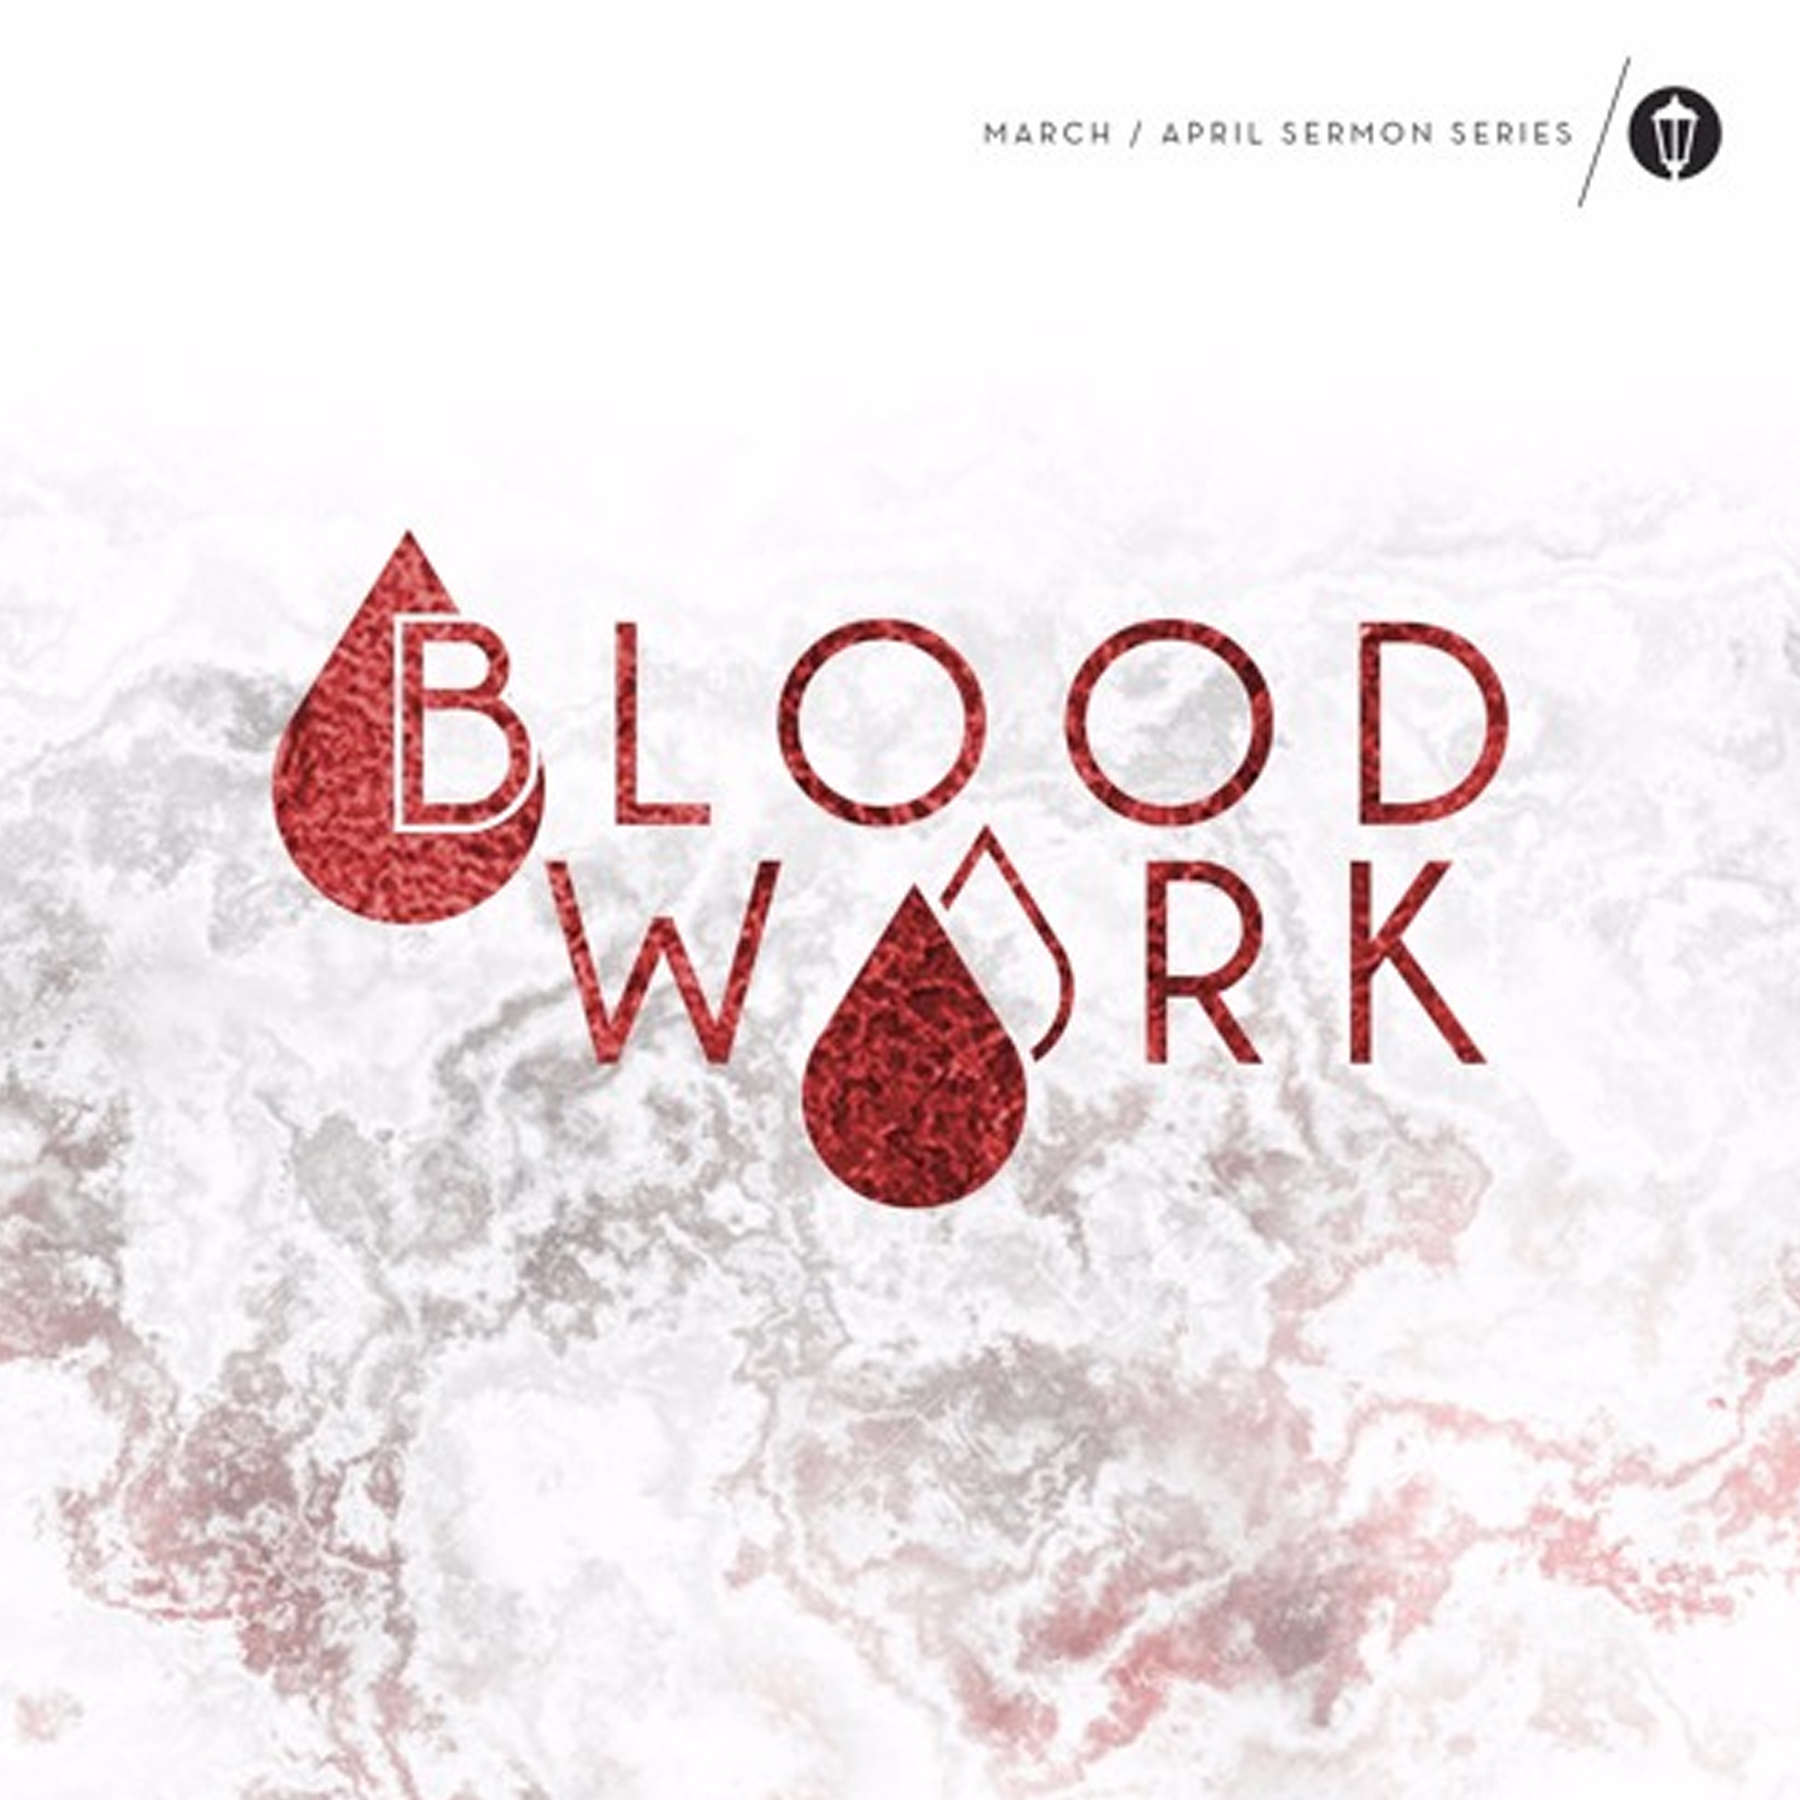 BloodWork - title square.jpg